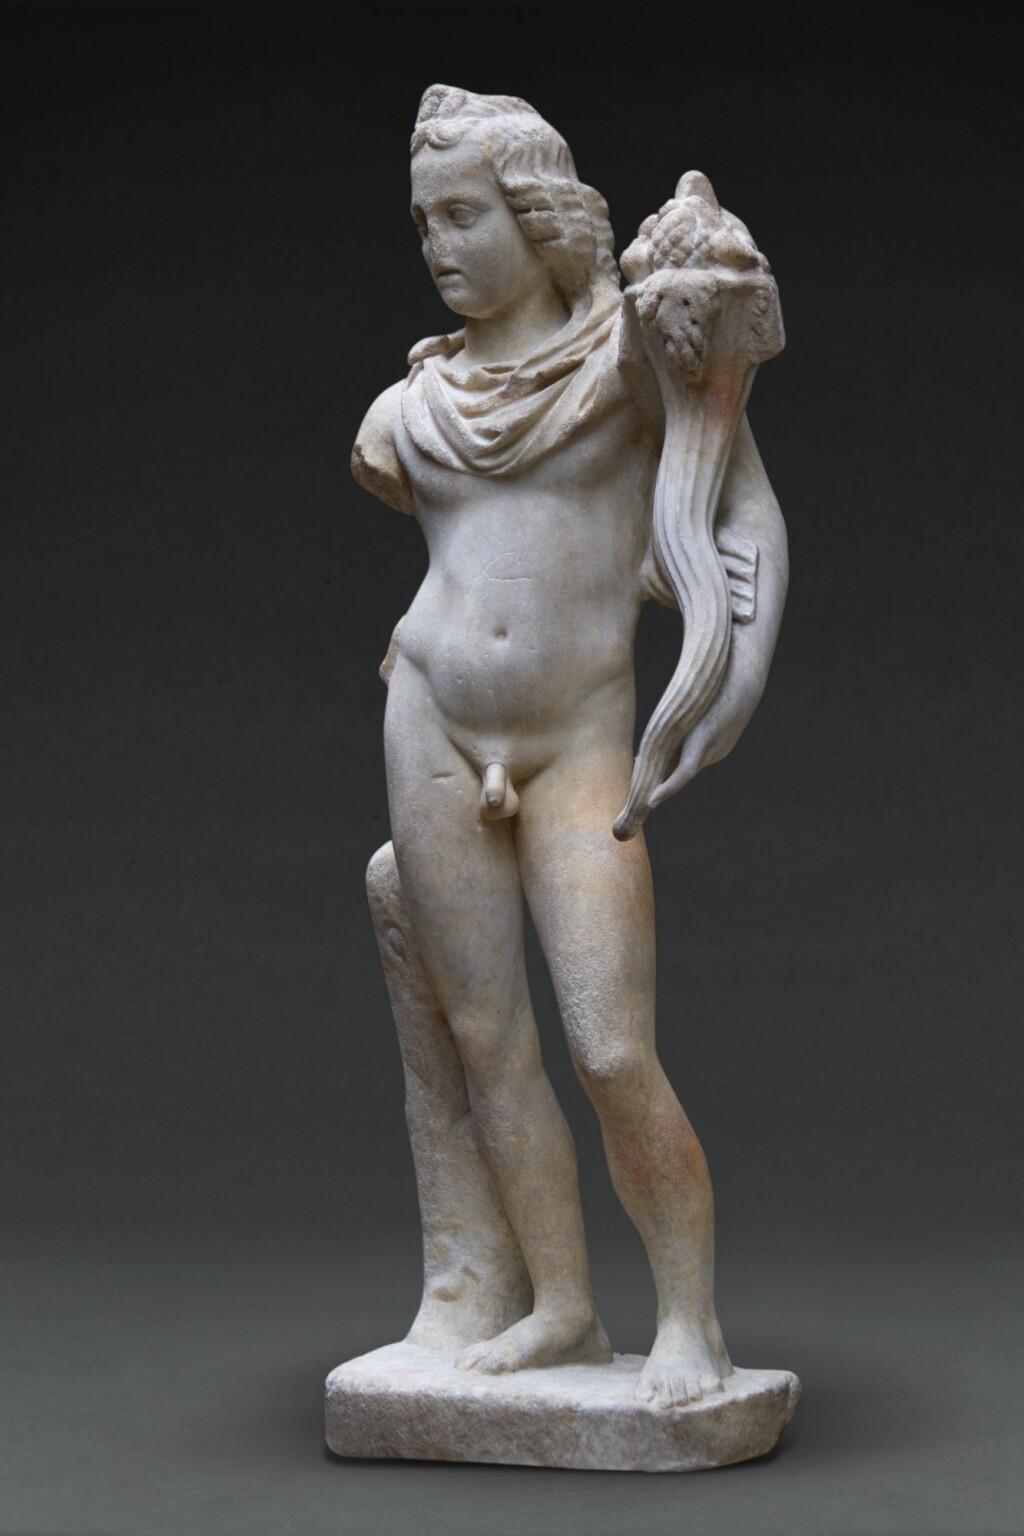 A ROMAN MARBLE FIGURE OF EROS-HARPOCRATES, CIRCA 2ND CENTURY A.D.